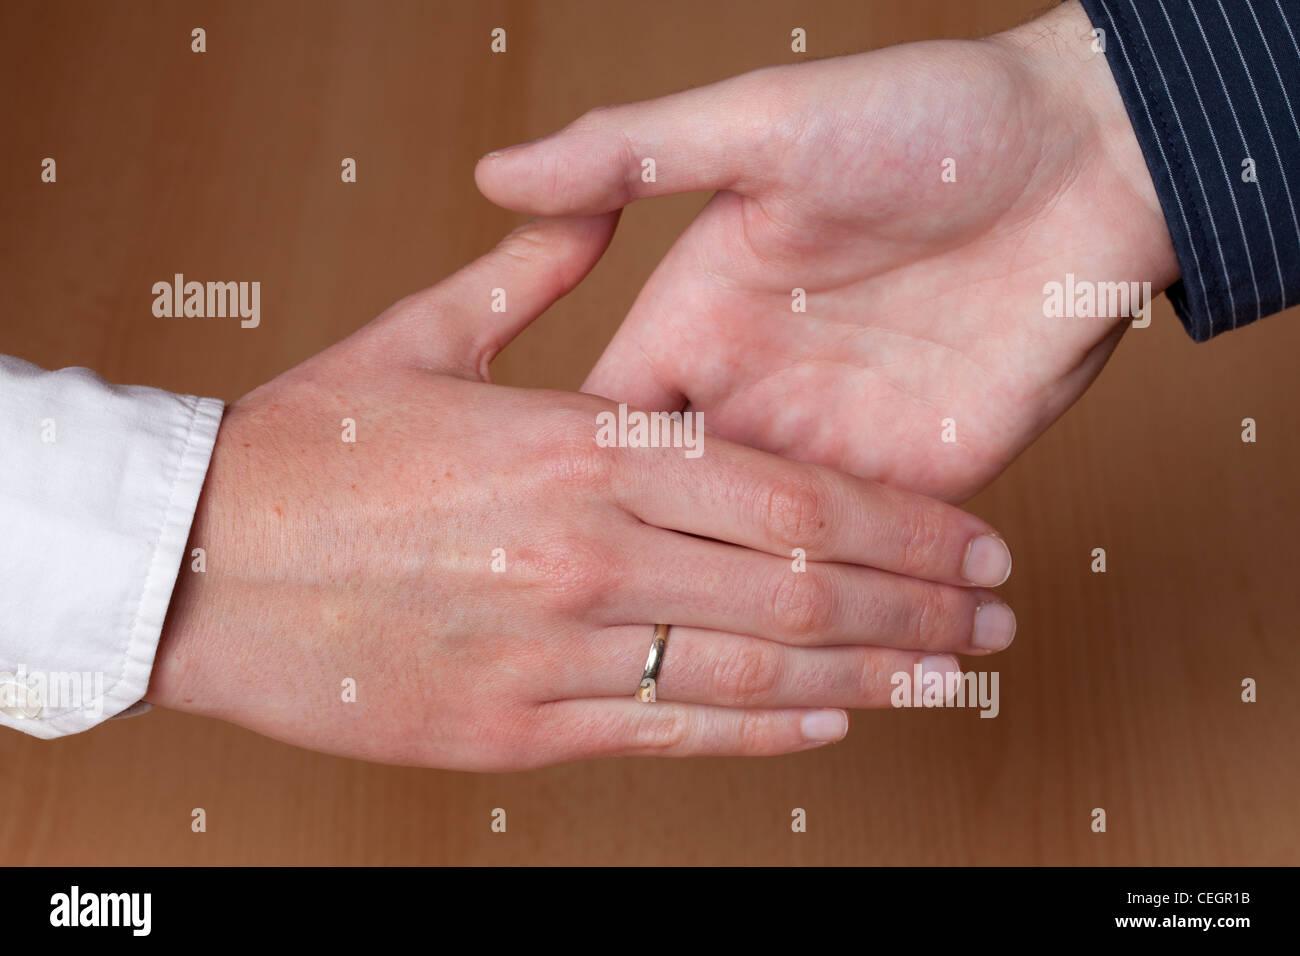 Ring Shake Stock Photos & Ring Shake Stock Images - Alamy